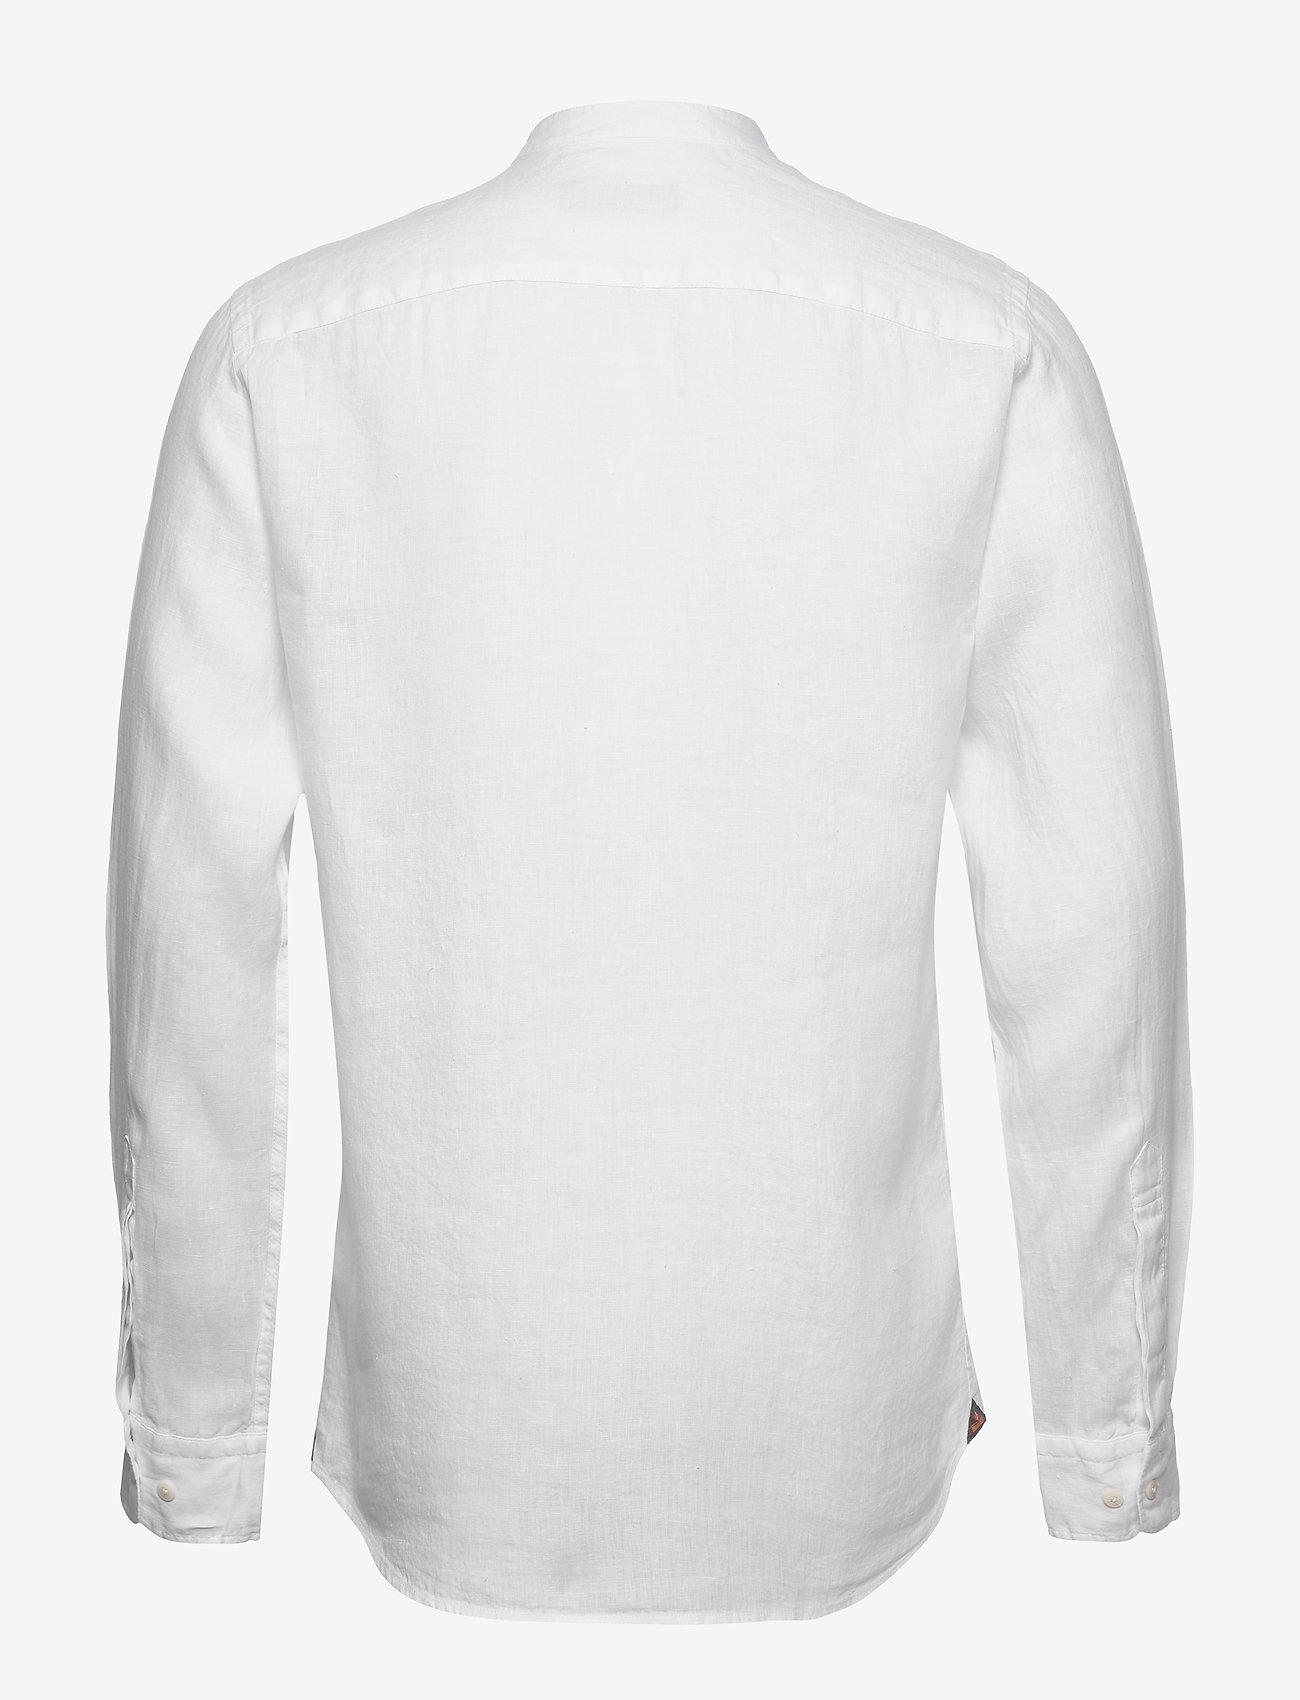 Nicolas Band Collar Shirt (White) (90.30 €) - Morris hDApo